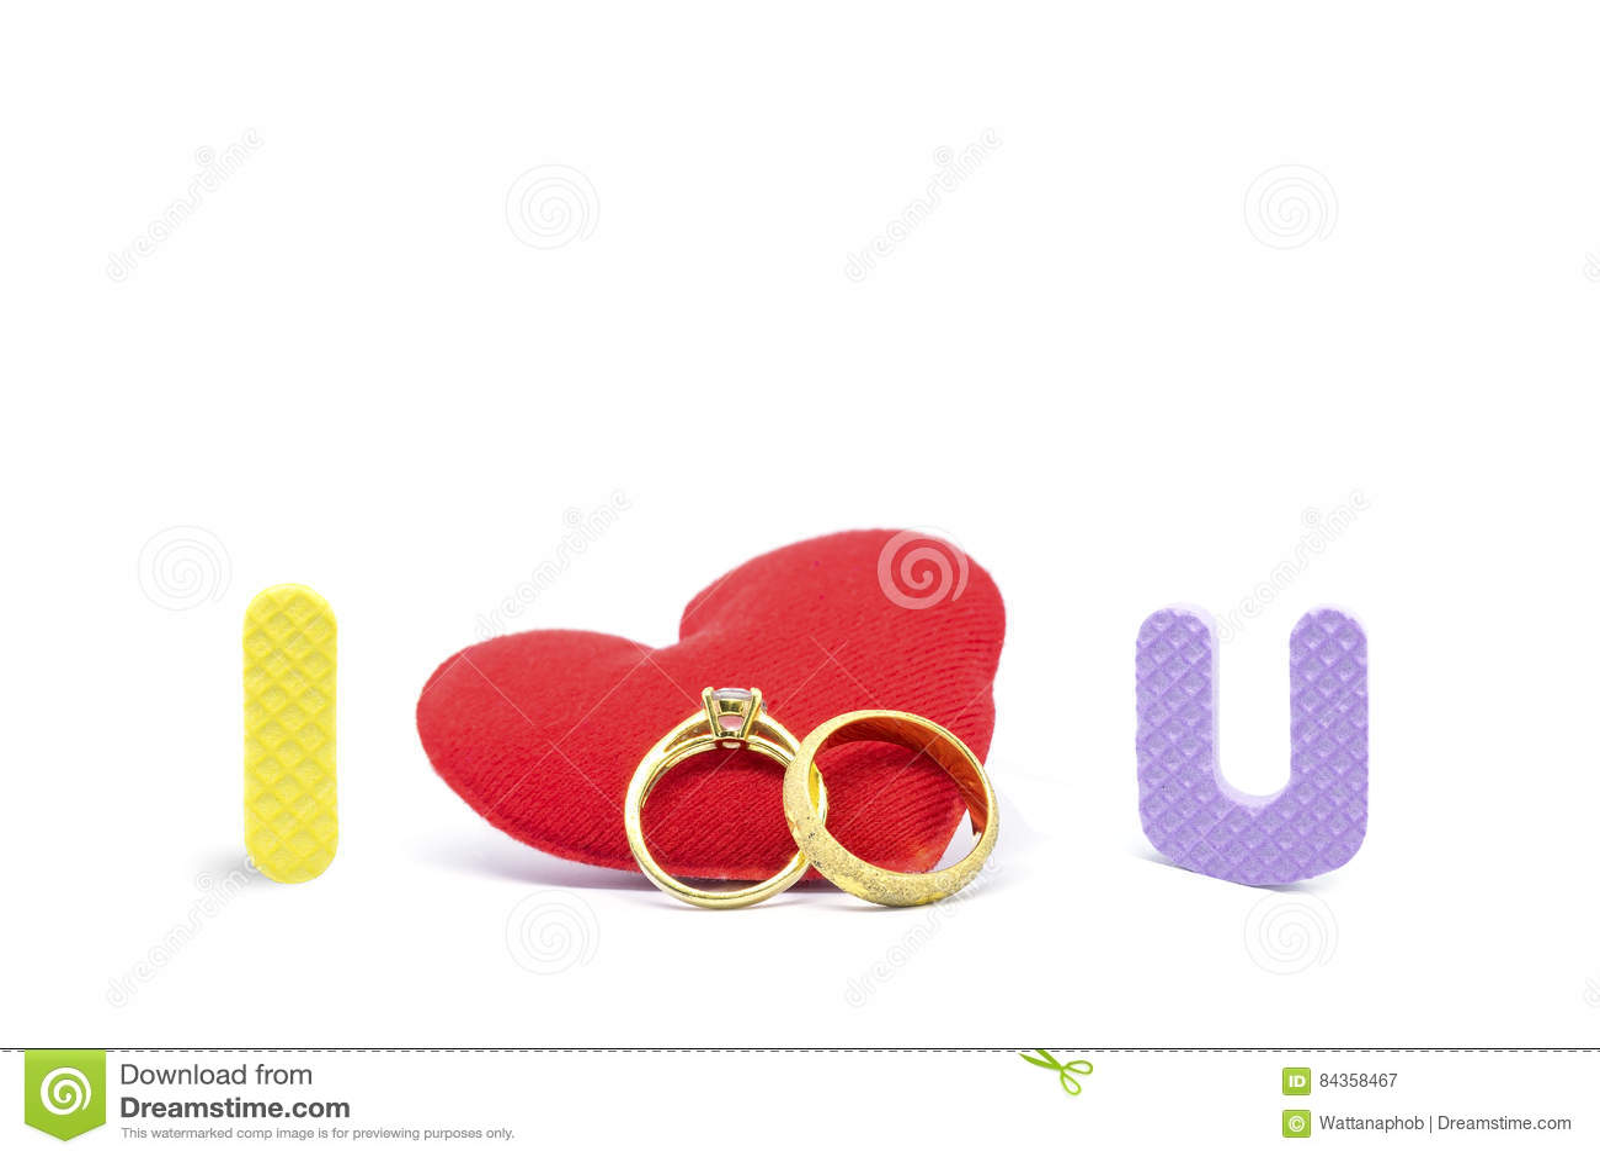 I Love You Stock Image Image Of Handwriting Decoration